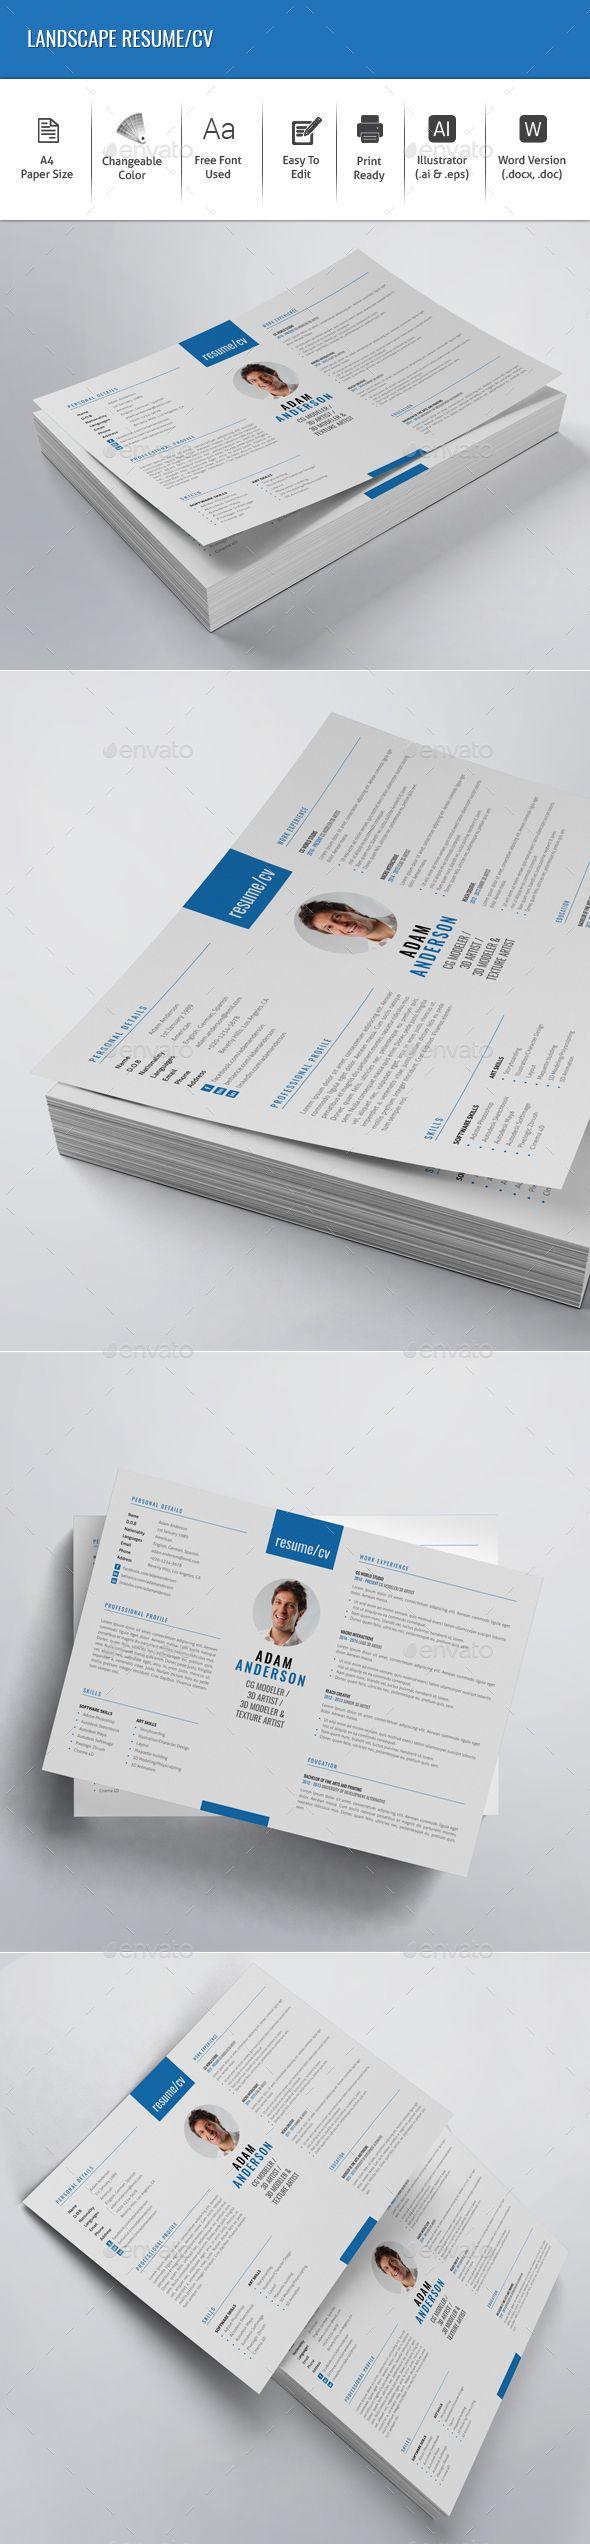 Landscape Resume/CV | Resume cv, Graphics and Resume layout